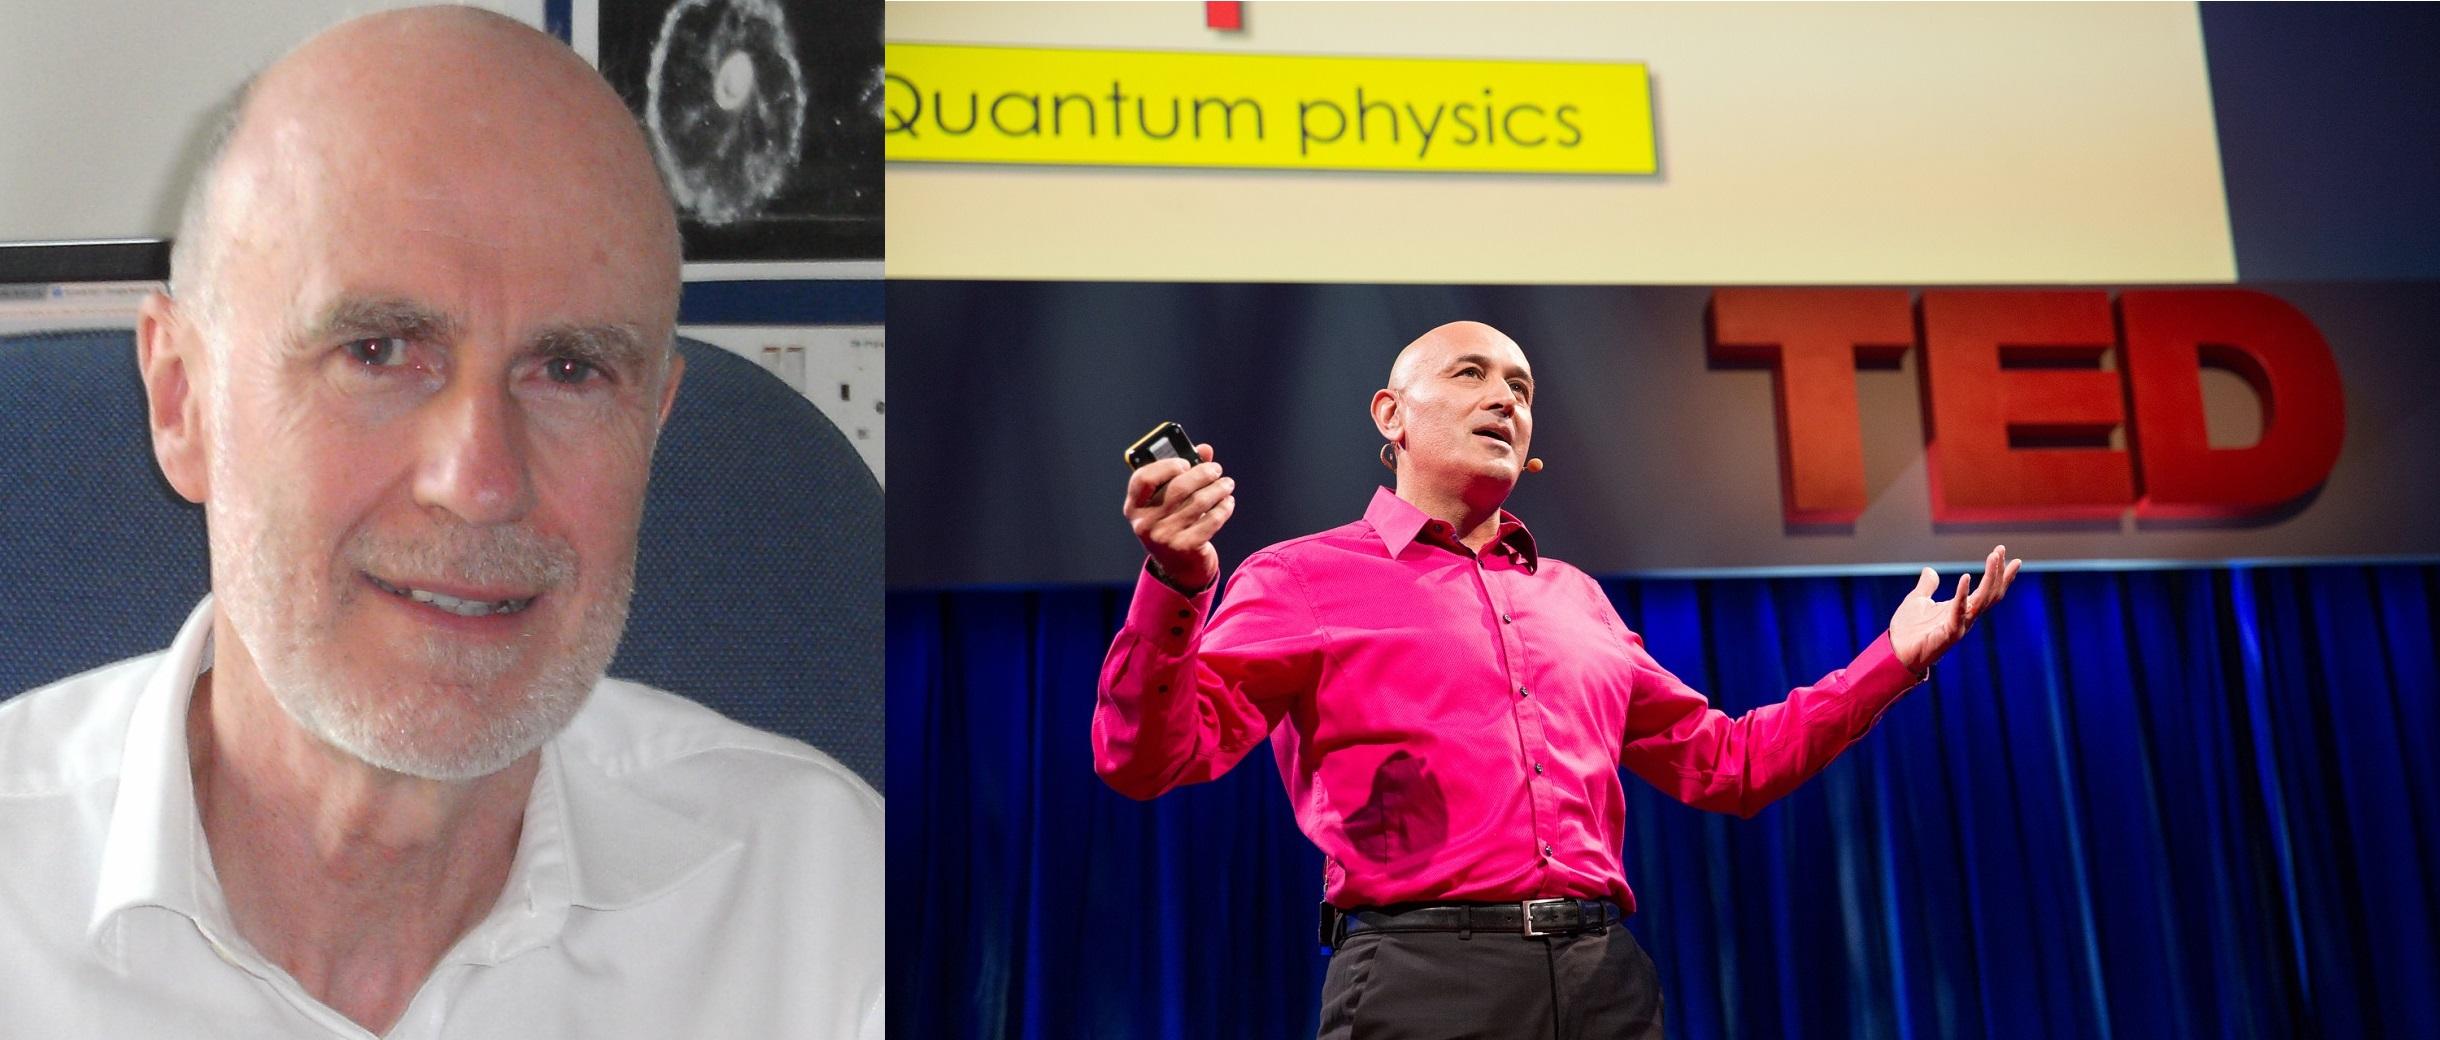 University of Surrey researchers Johnjoe McFadden (left) and Jim Al-Khalili (right) have become vocal advocates for quantum biology.   Johnjoe McFadden/Wikipedia  (CC BY 3.0);  James Duncan Davidson, TED/Flickr  (CC BY NC 2.0)